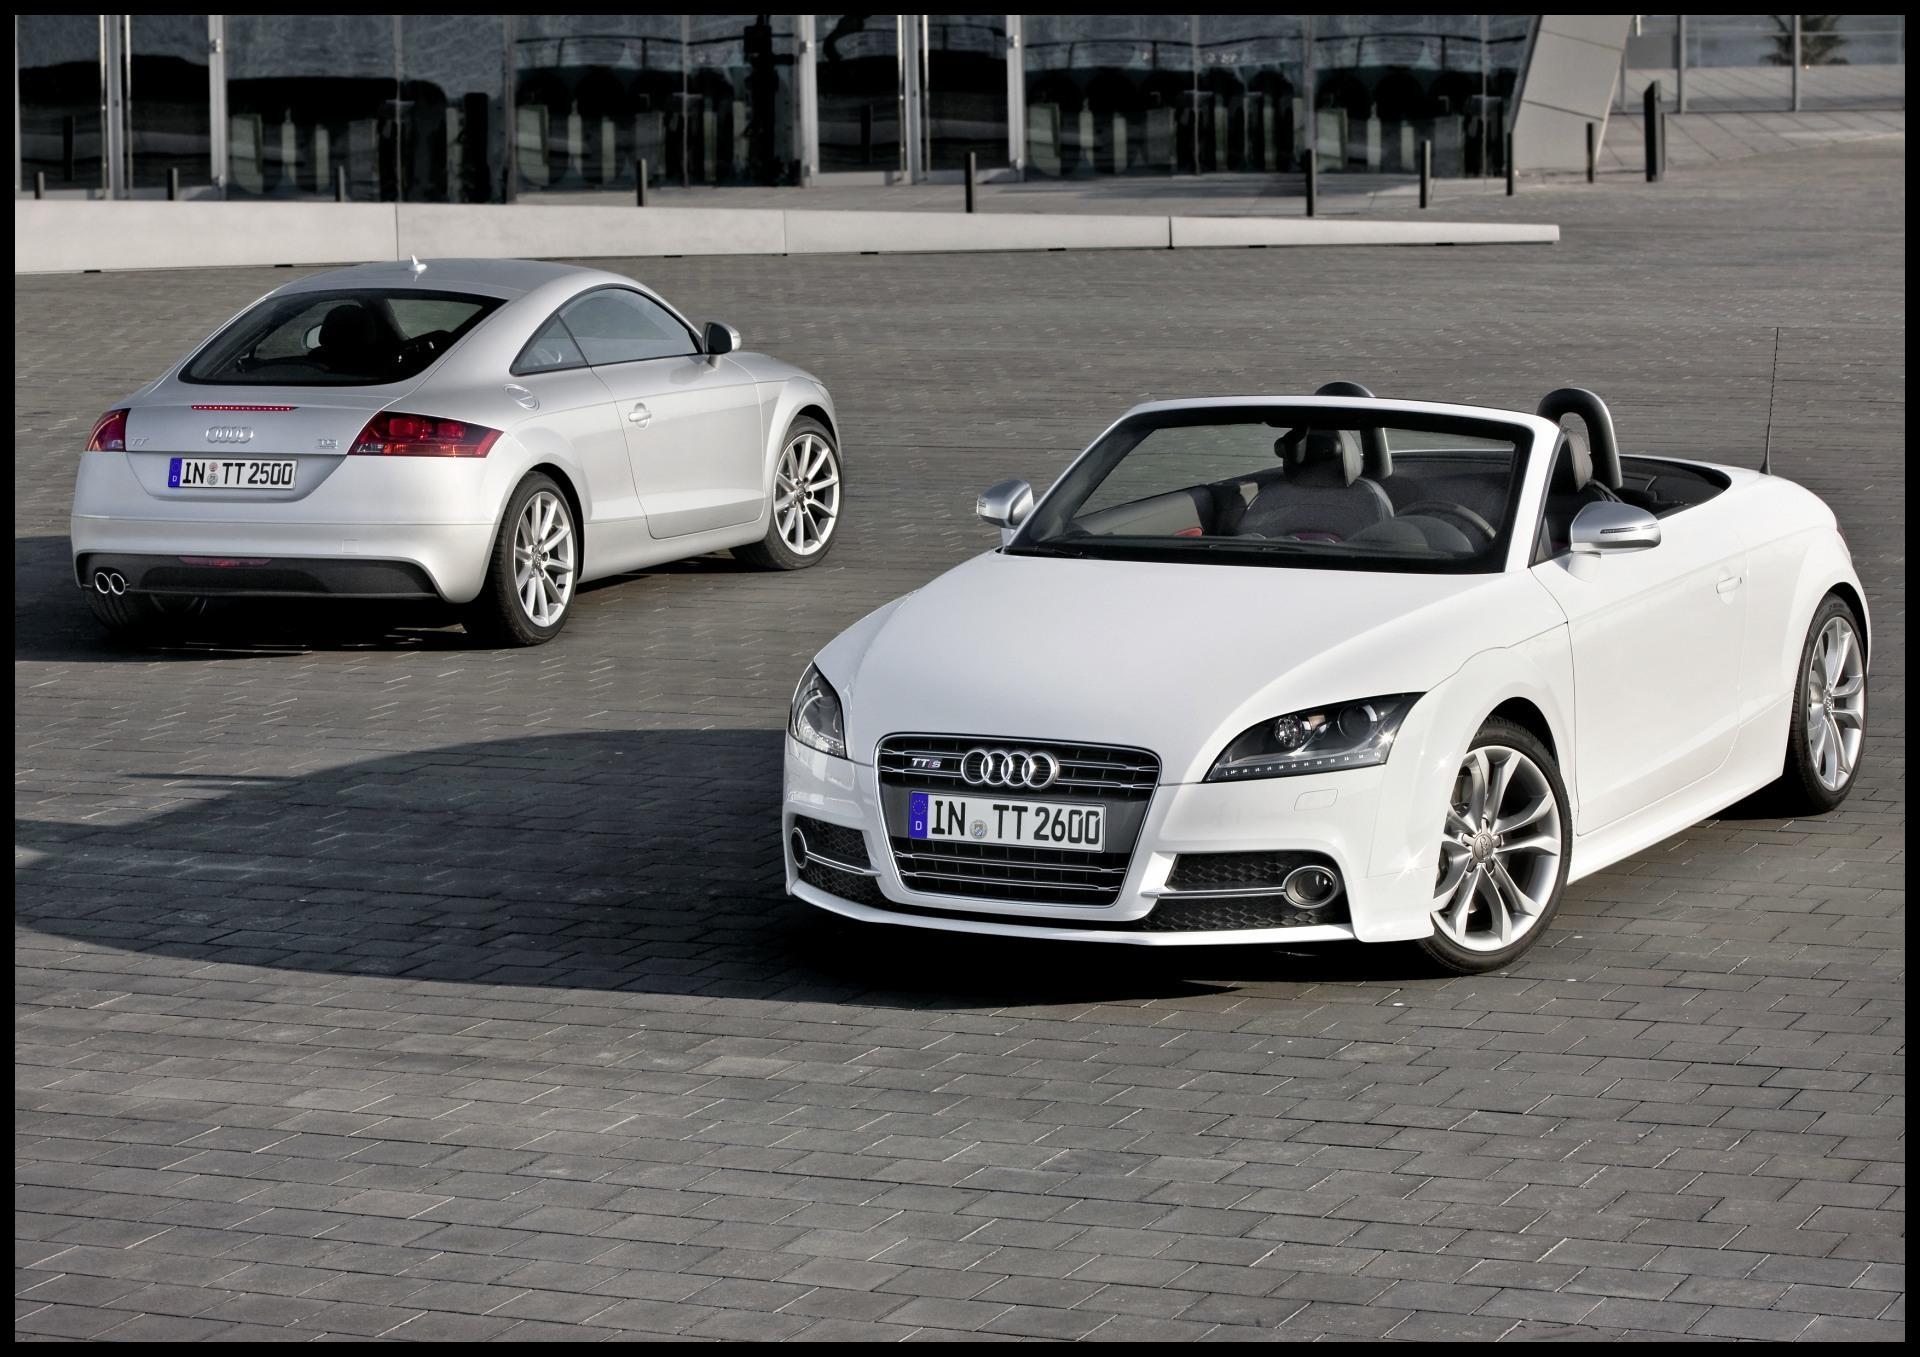 2011 Audi TT Image 01